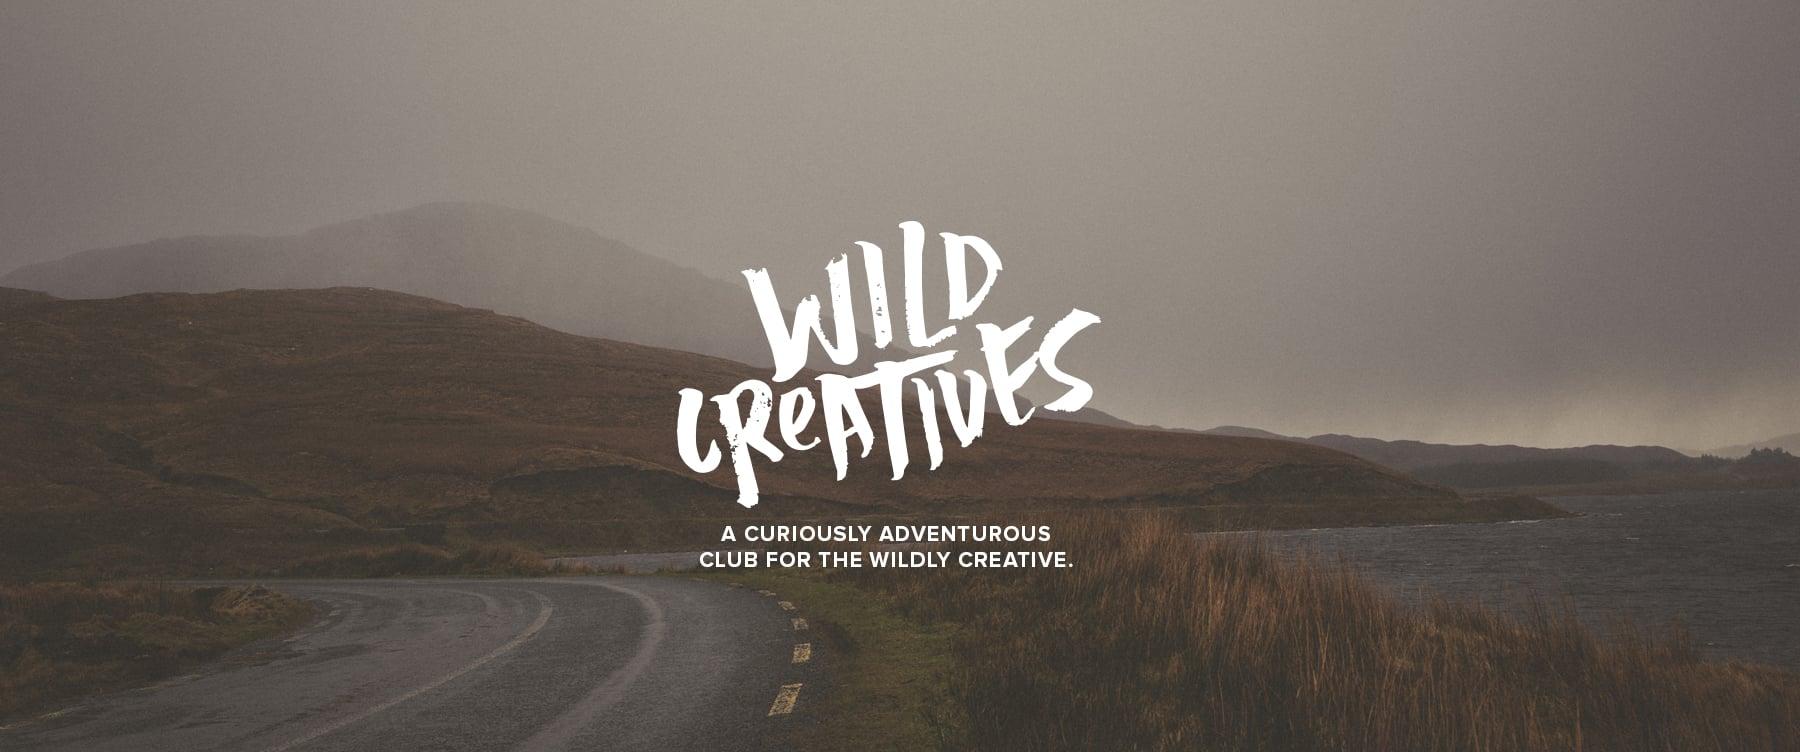 HomePage_WildCreatives_TheWildCreativs_Adventure_KansasCity_Workshops_03.jpg